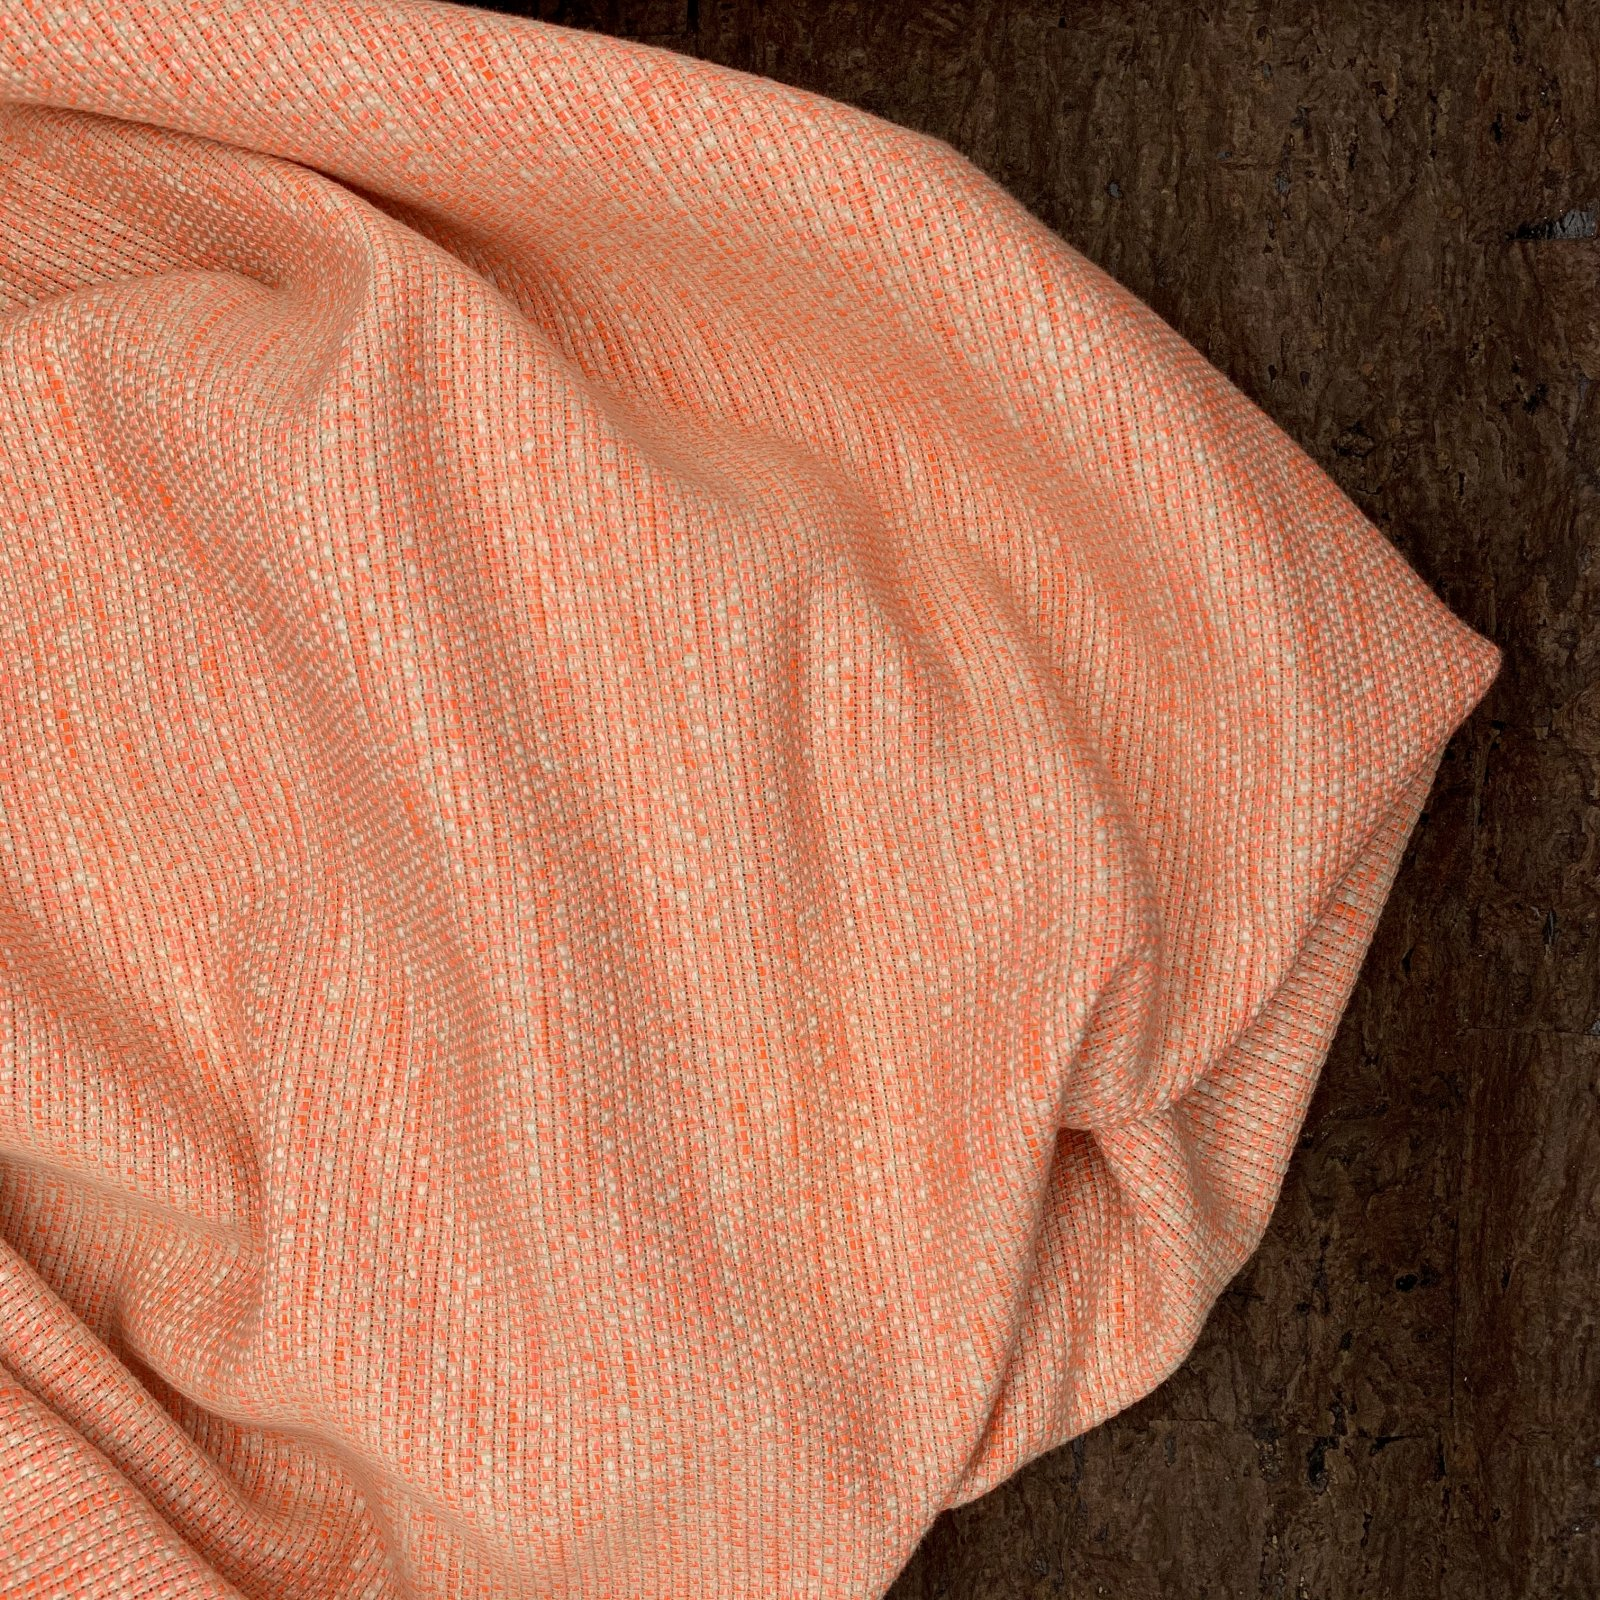 Cotton Suiting - Neon Orange & Tan